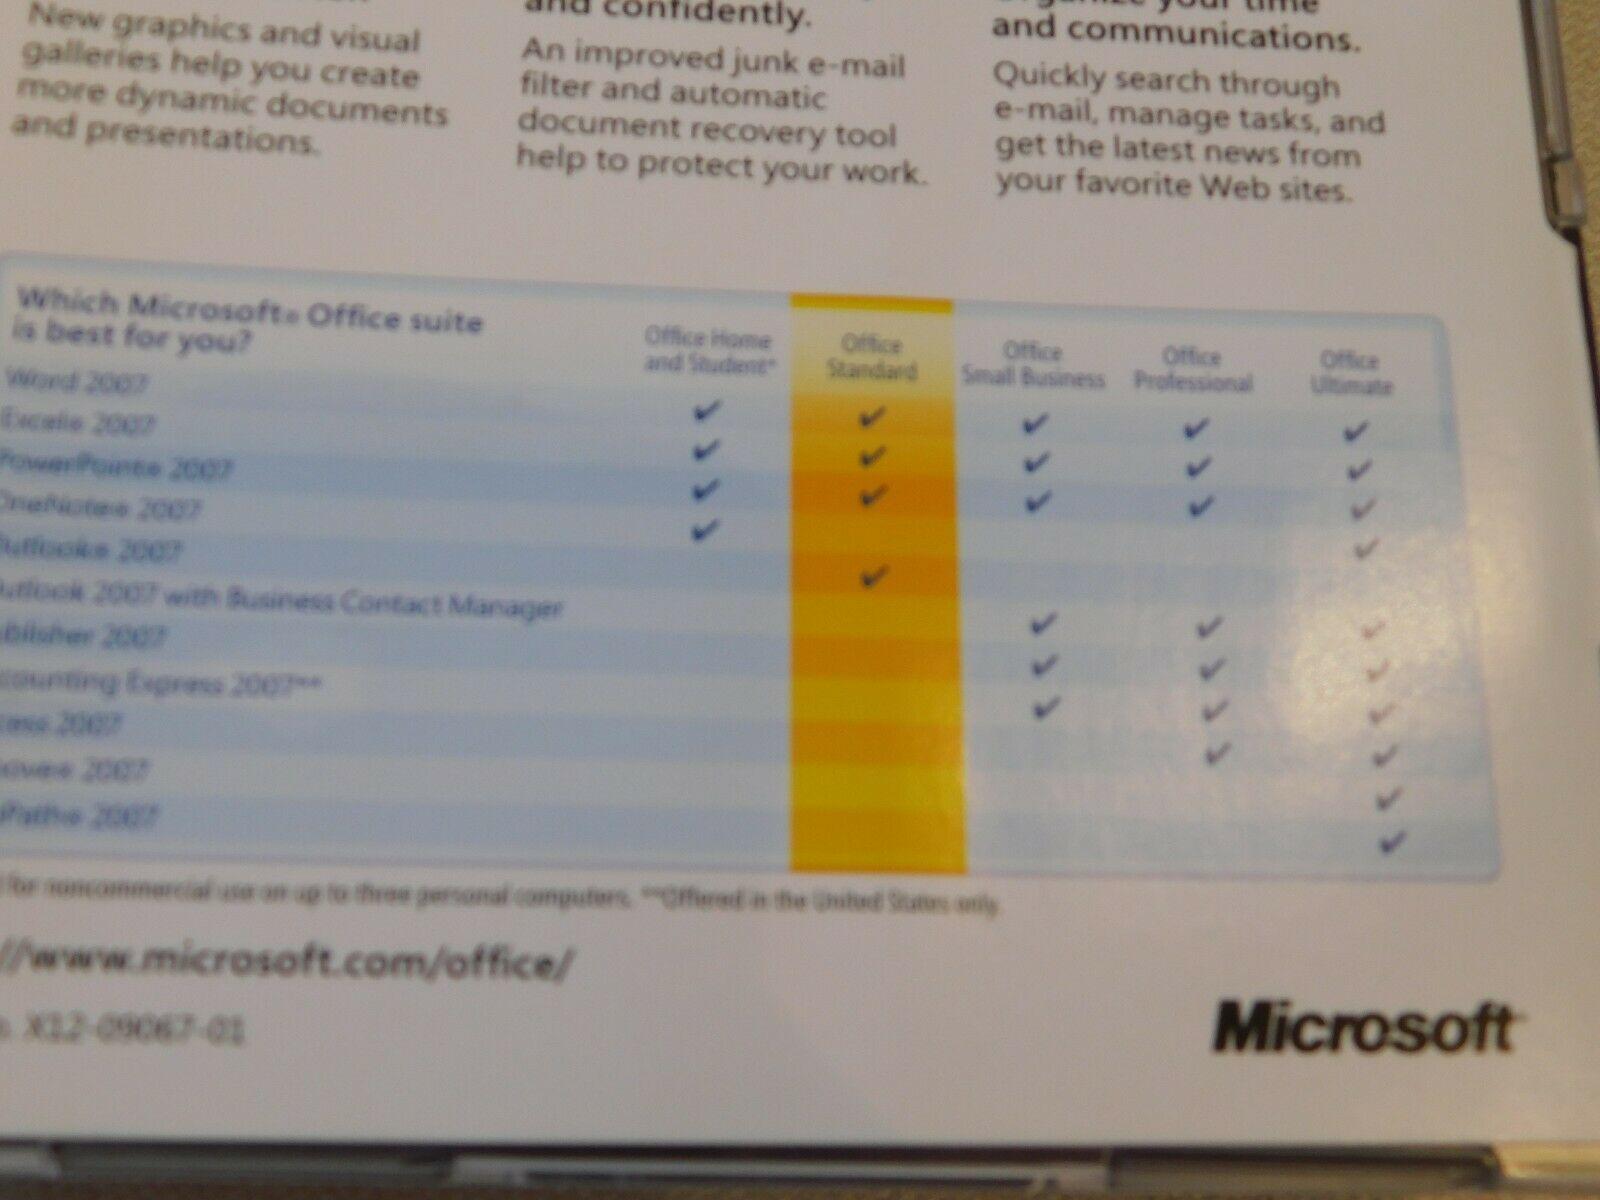 Microsoft Büro Standard 2007 PC Upgrade 021-07668 Geöffnet NOS Neu Word Excel image 7